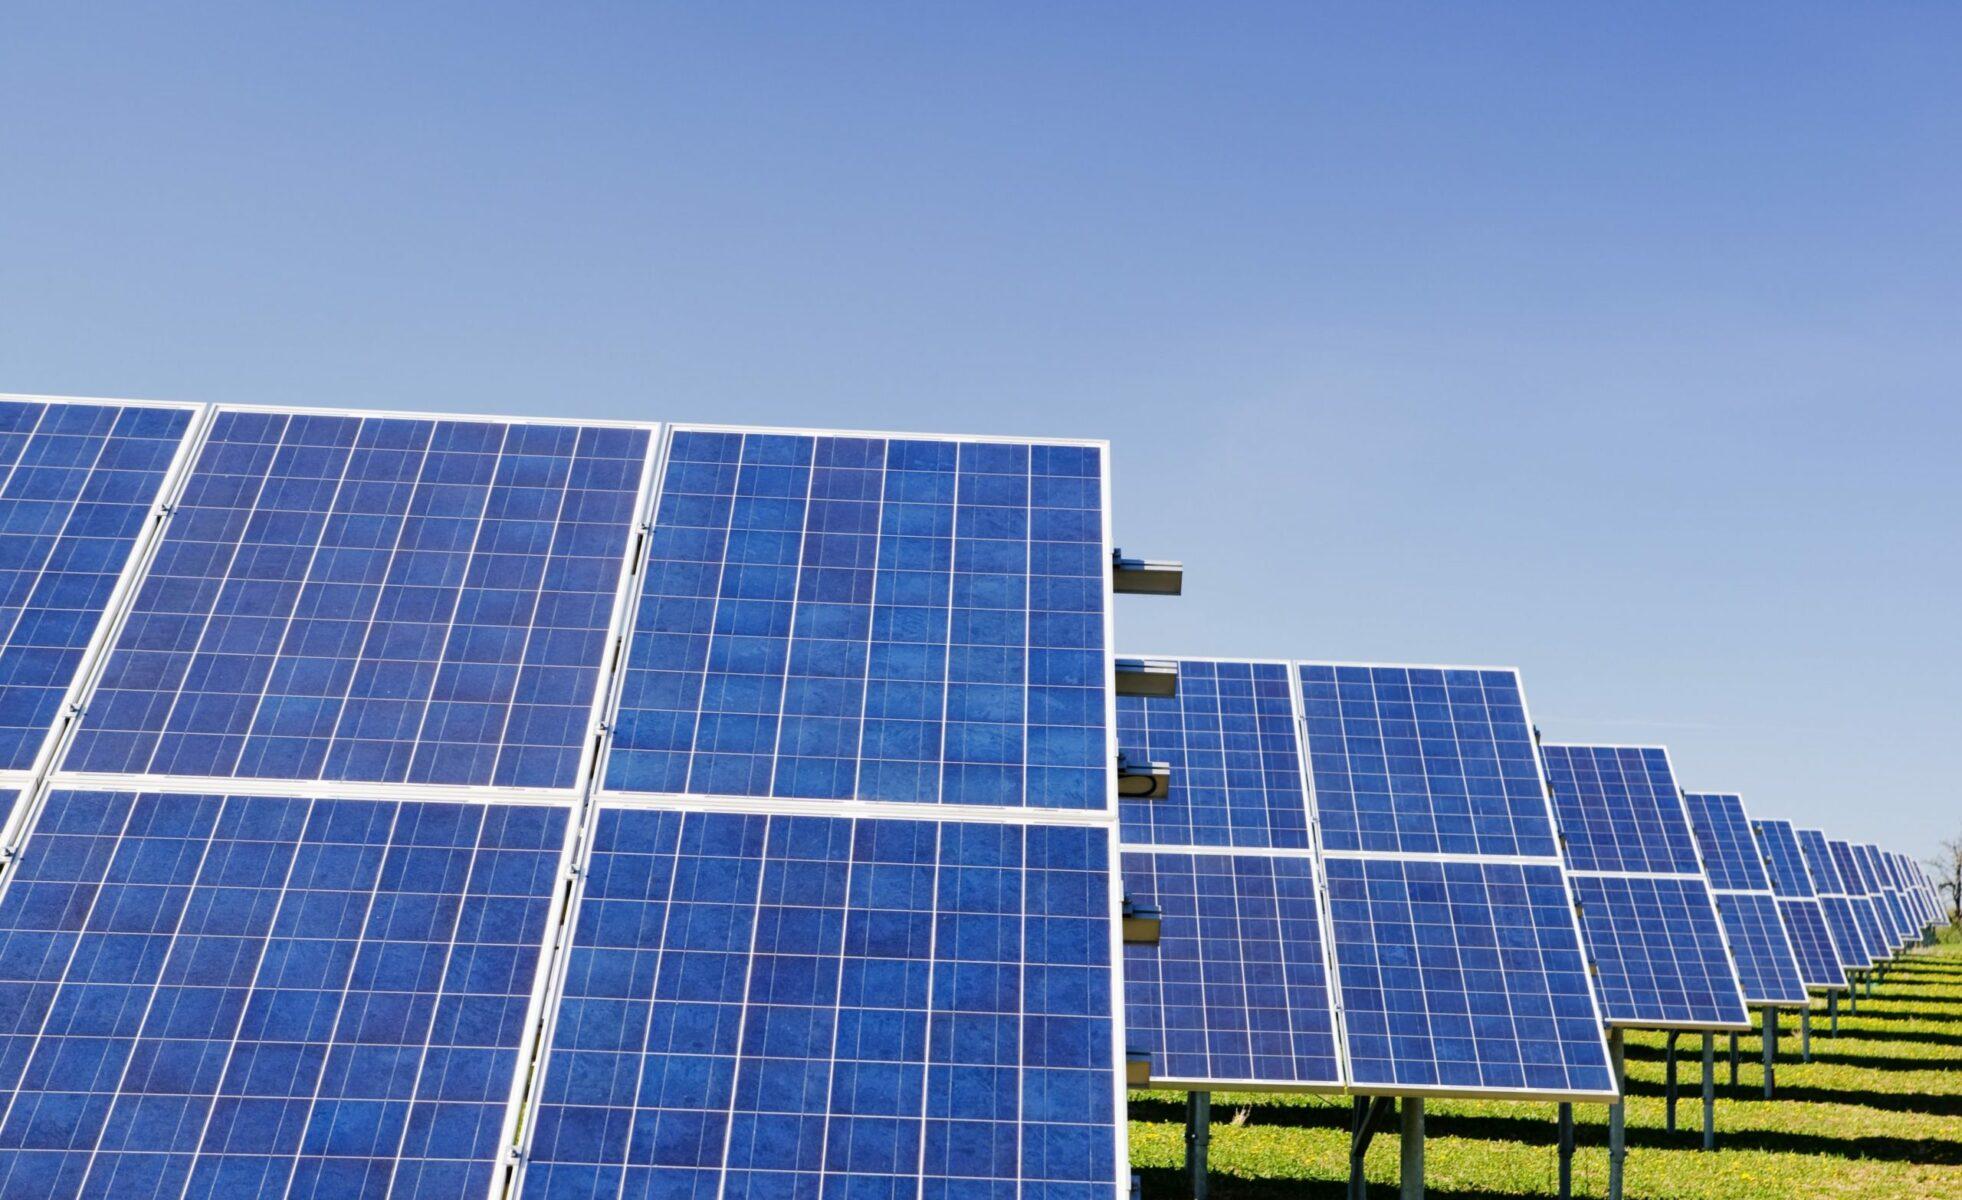 future trends solar punks and zero waste